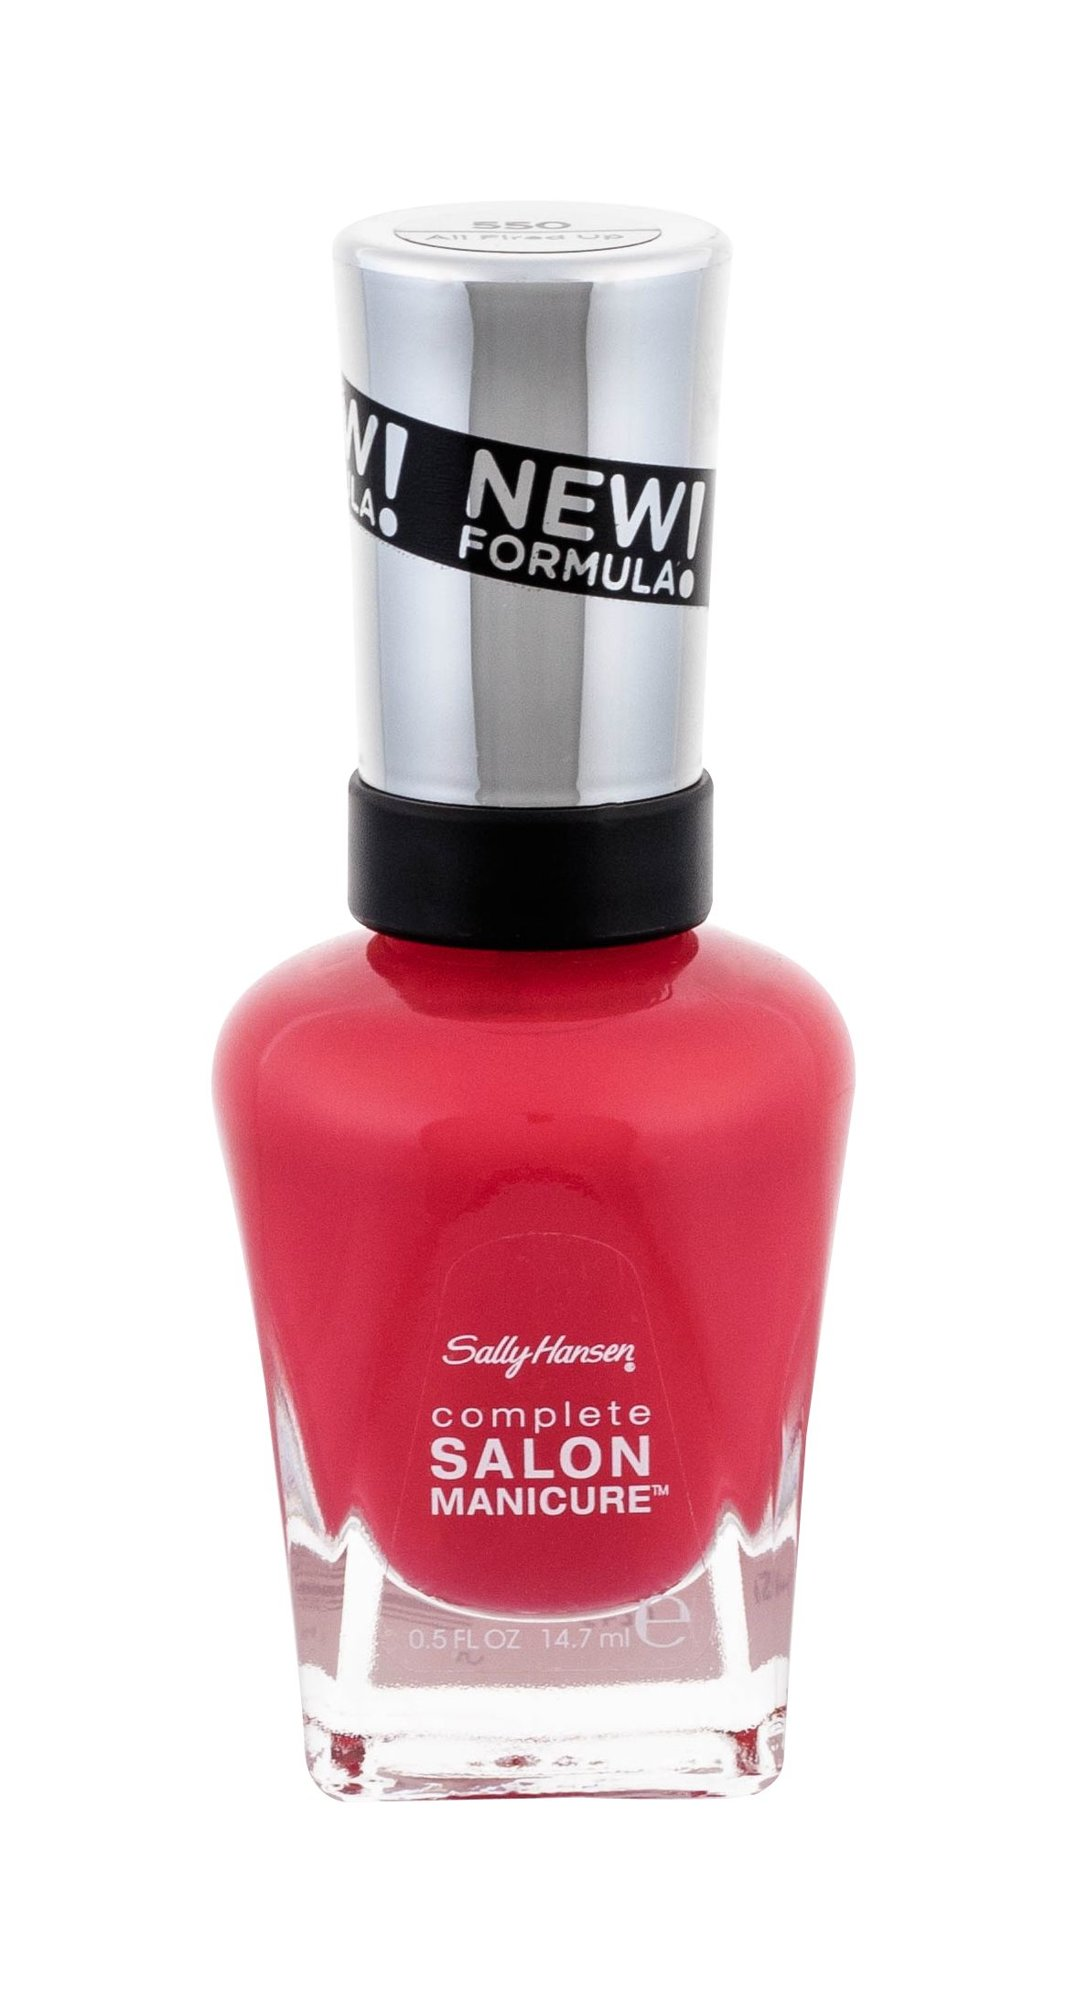 Sally Hansen Complete Salon Manicure Cosmetic 14,7ml 540 Frutti Petutie